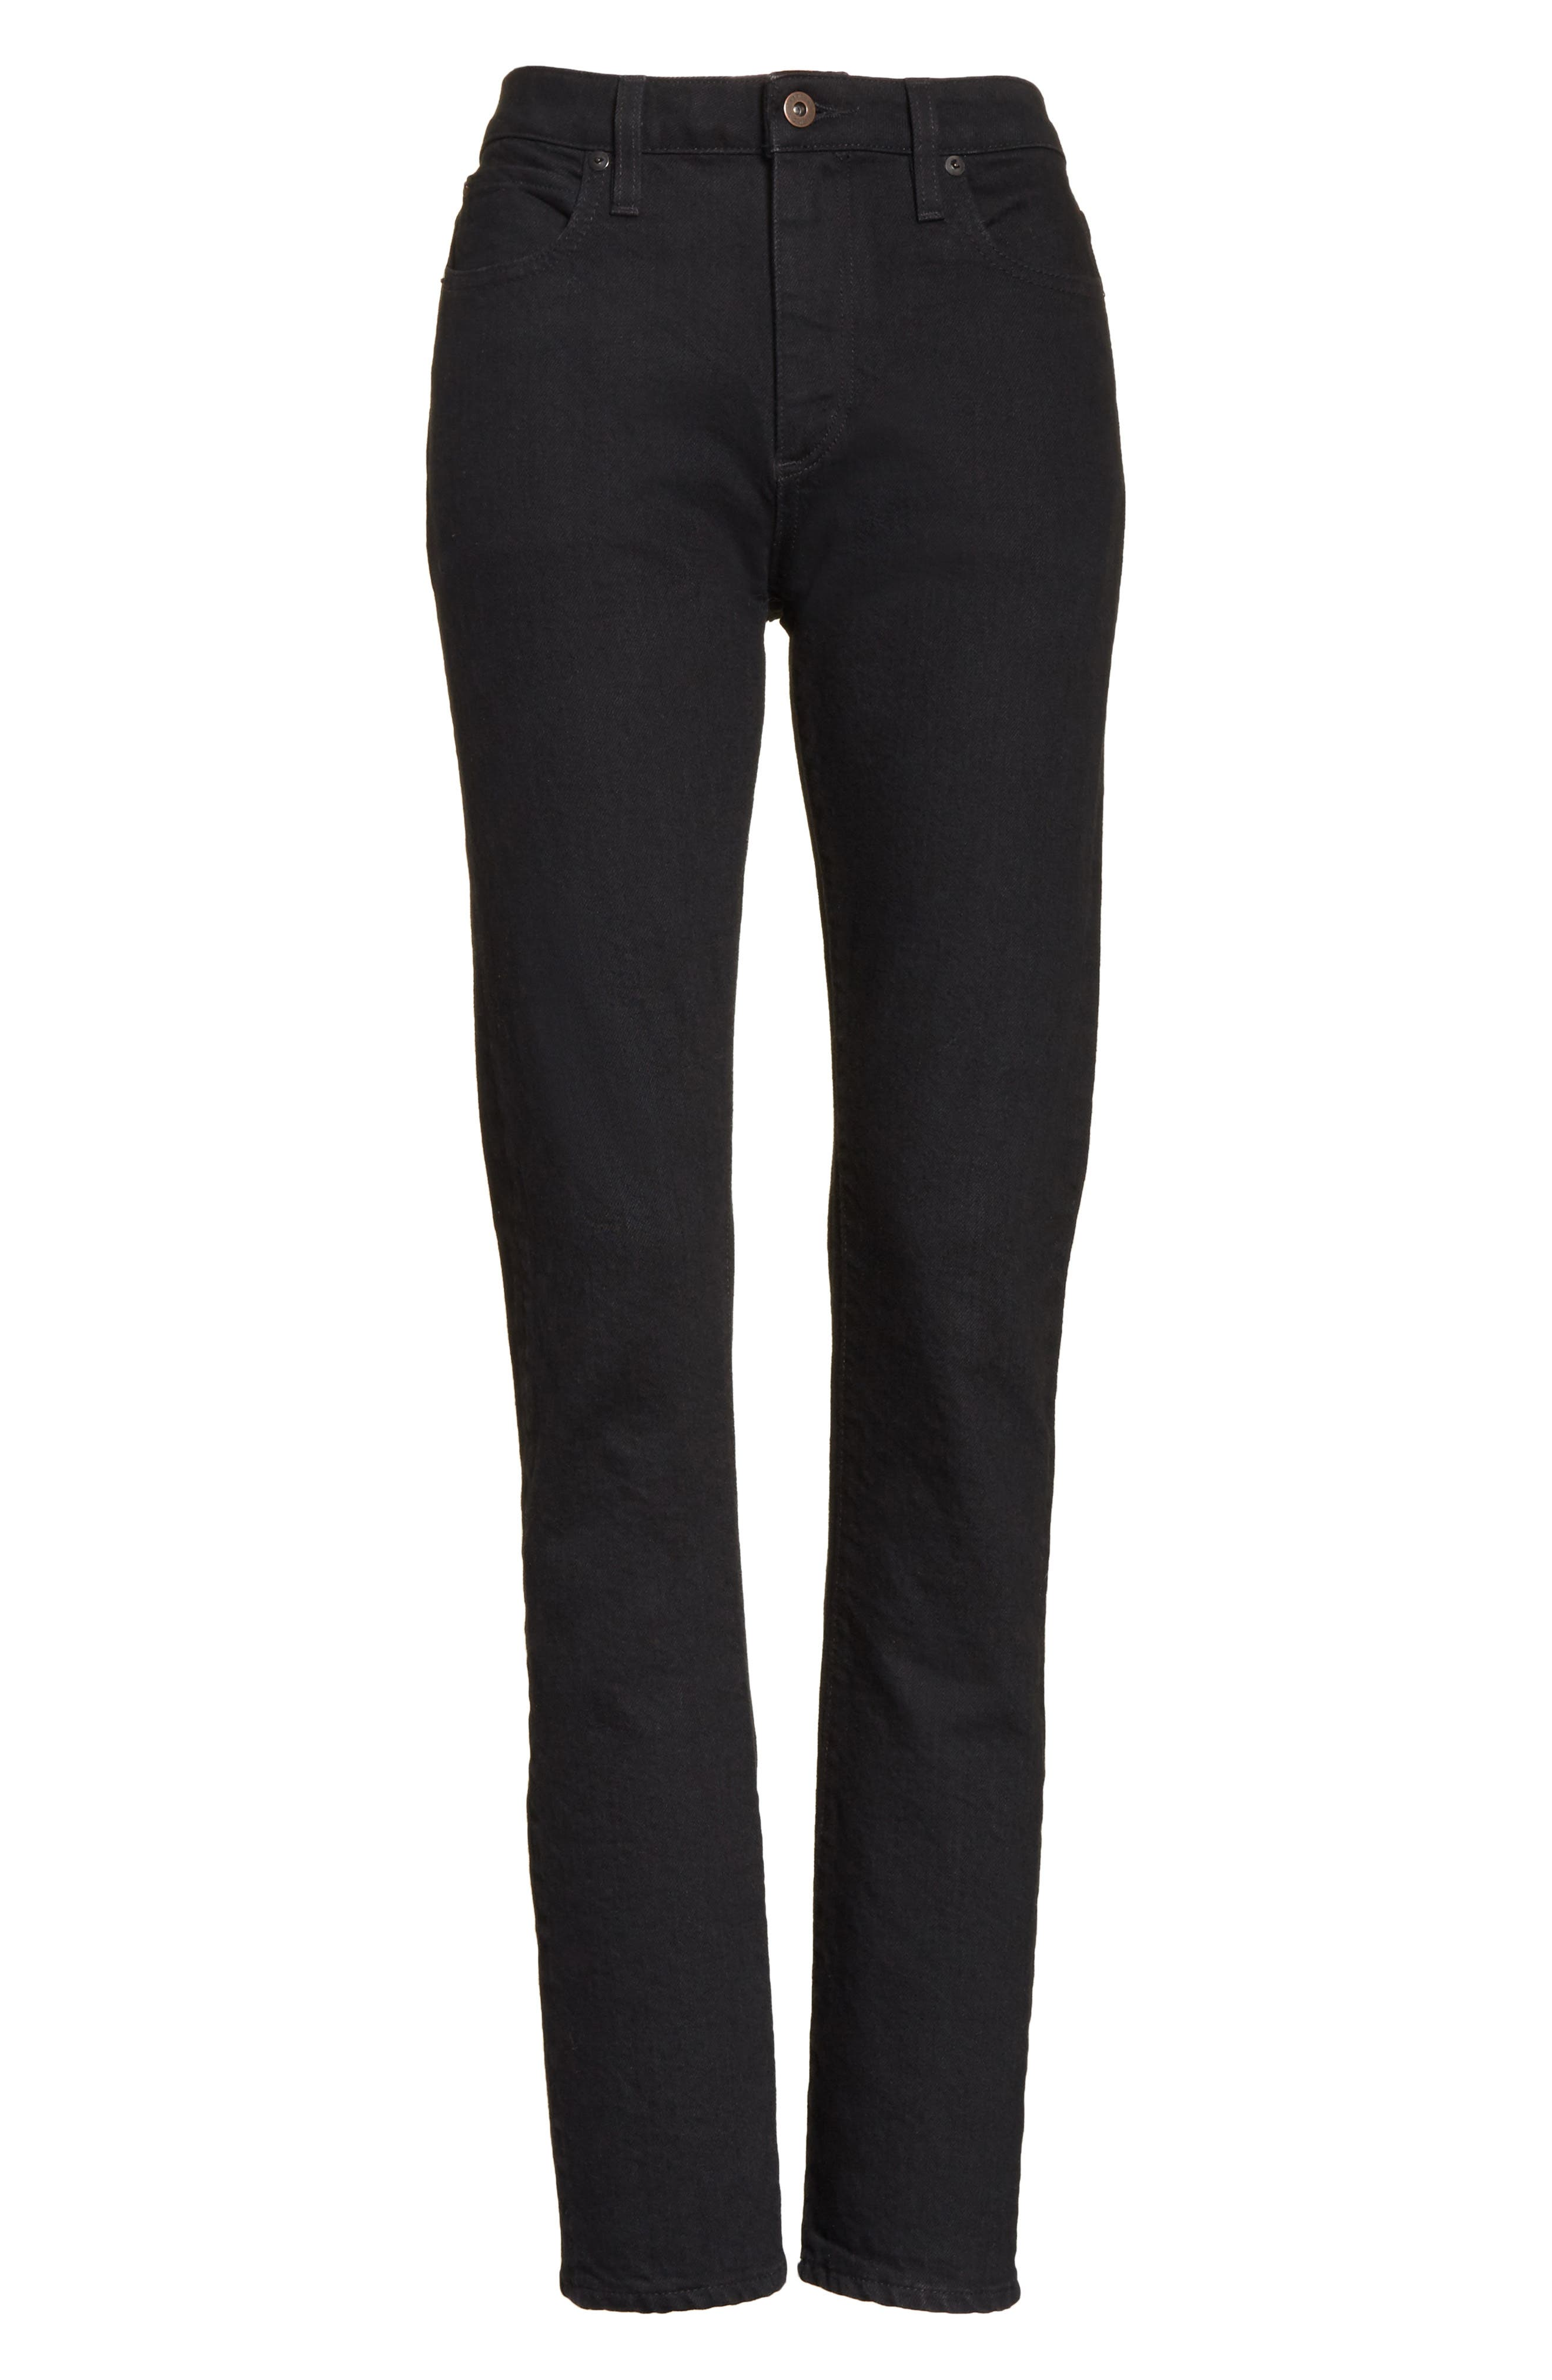 Boyd High Rise Jeans,                             Alternate thumbnail 6, color,                             Black